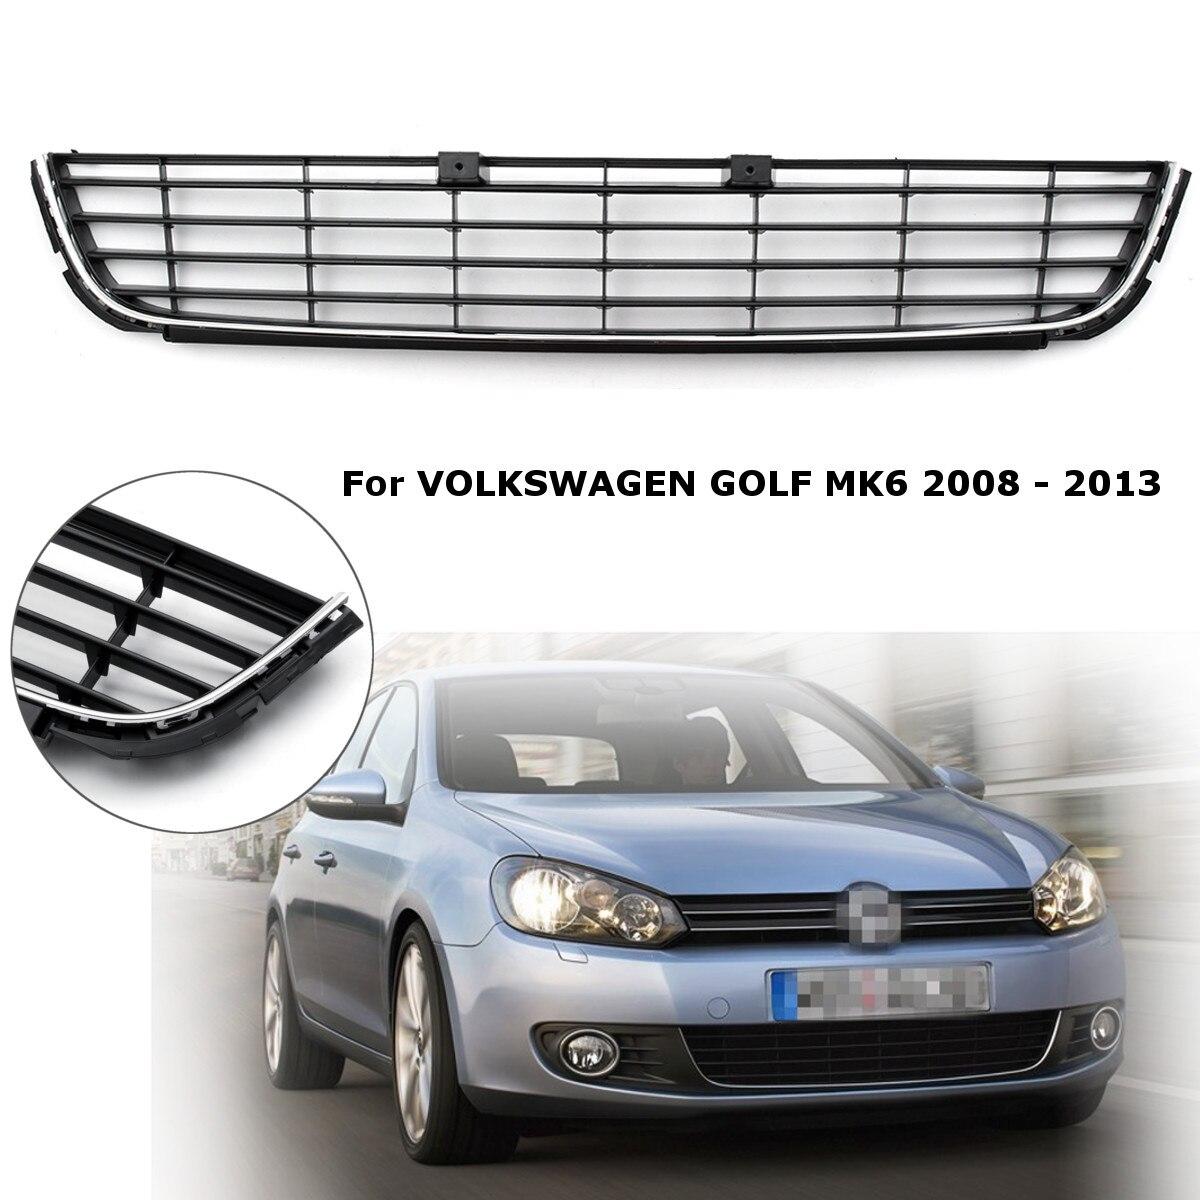 Car Front Lower Center Bumper Grille Panel Chrome Trim For VW GOLF MK6 2008 2009 2010 21011 2012 2013 grille